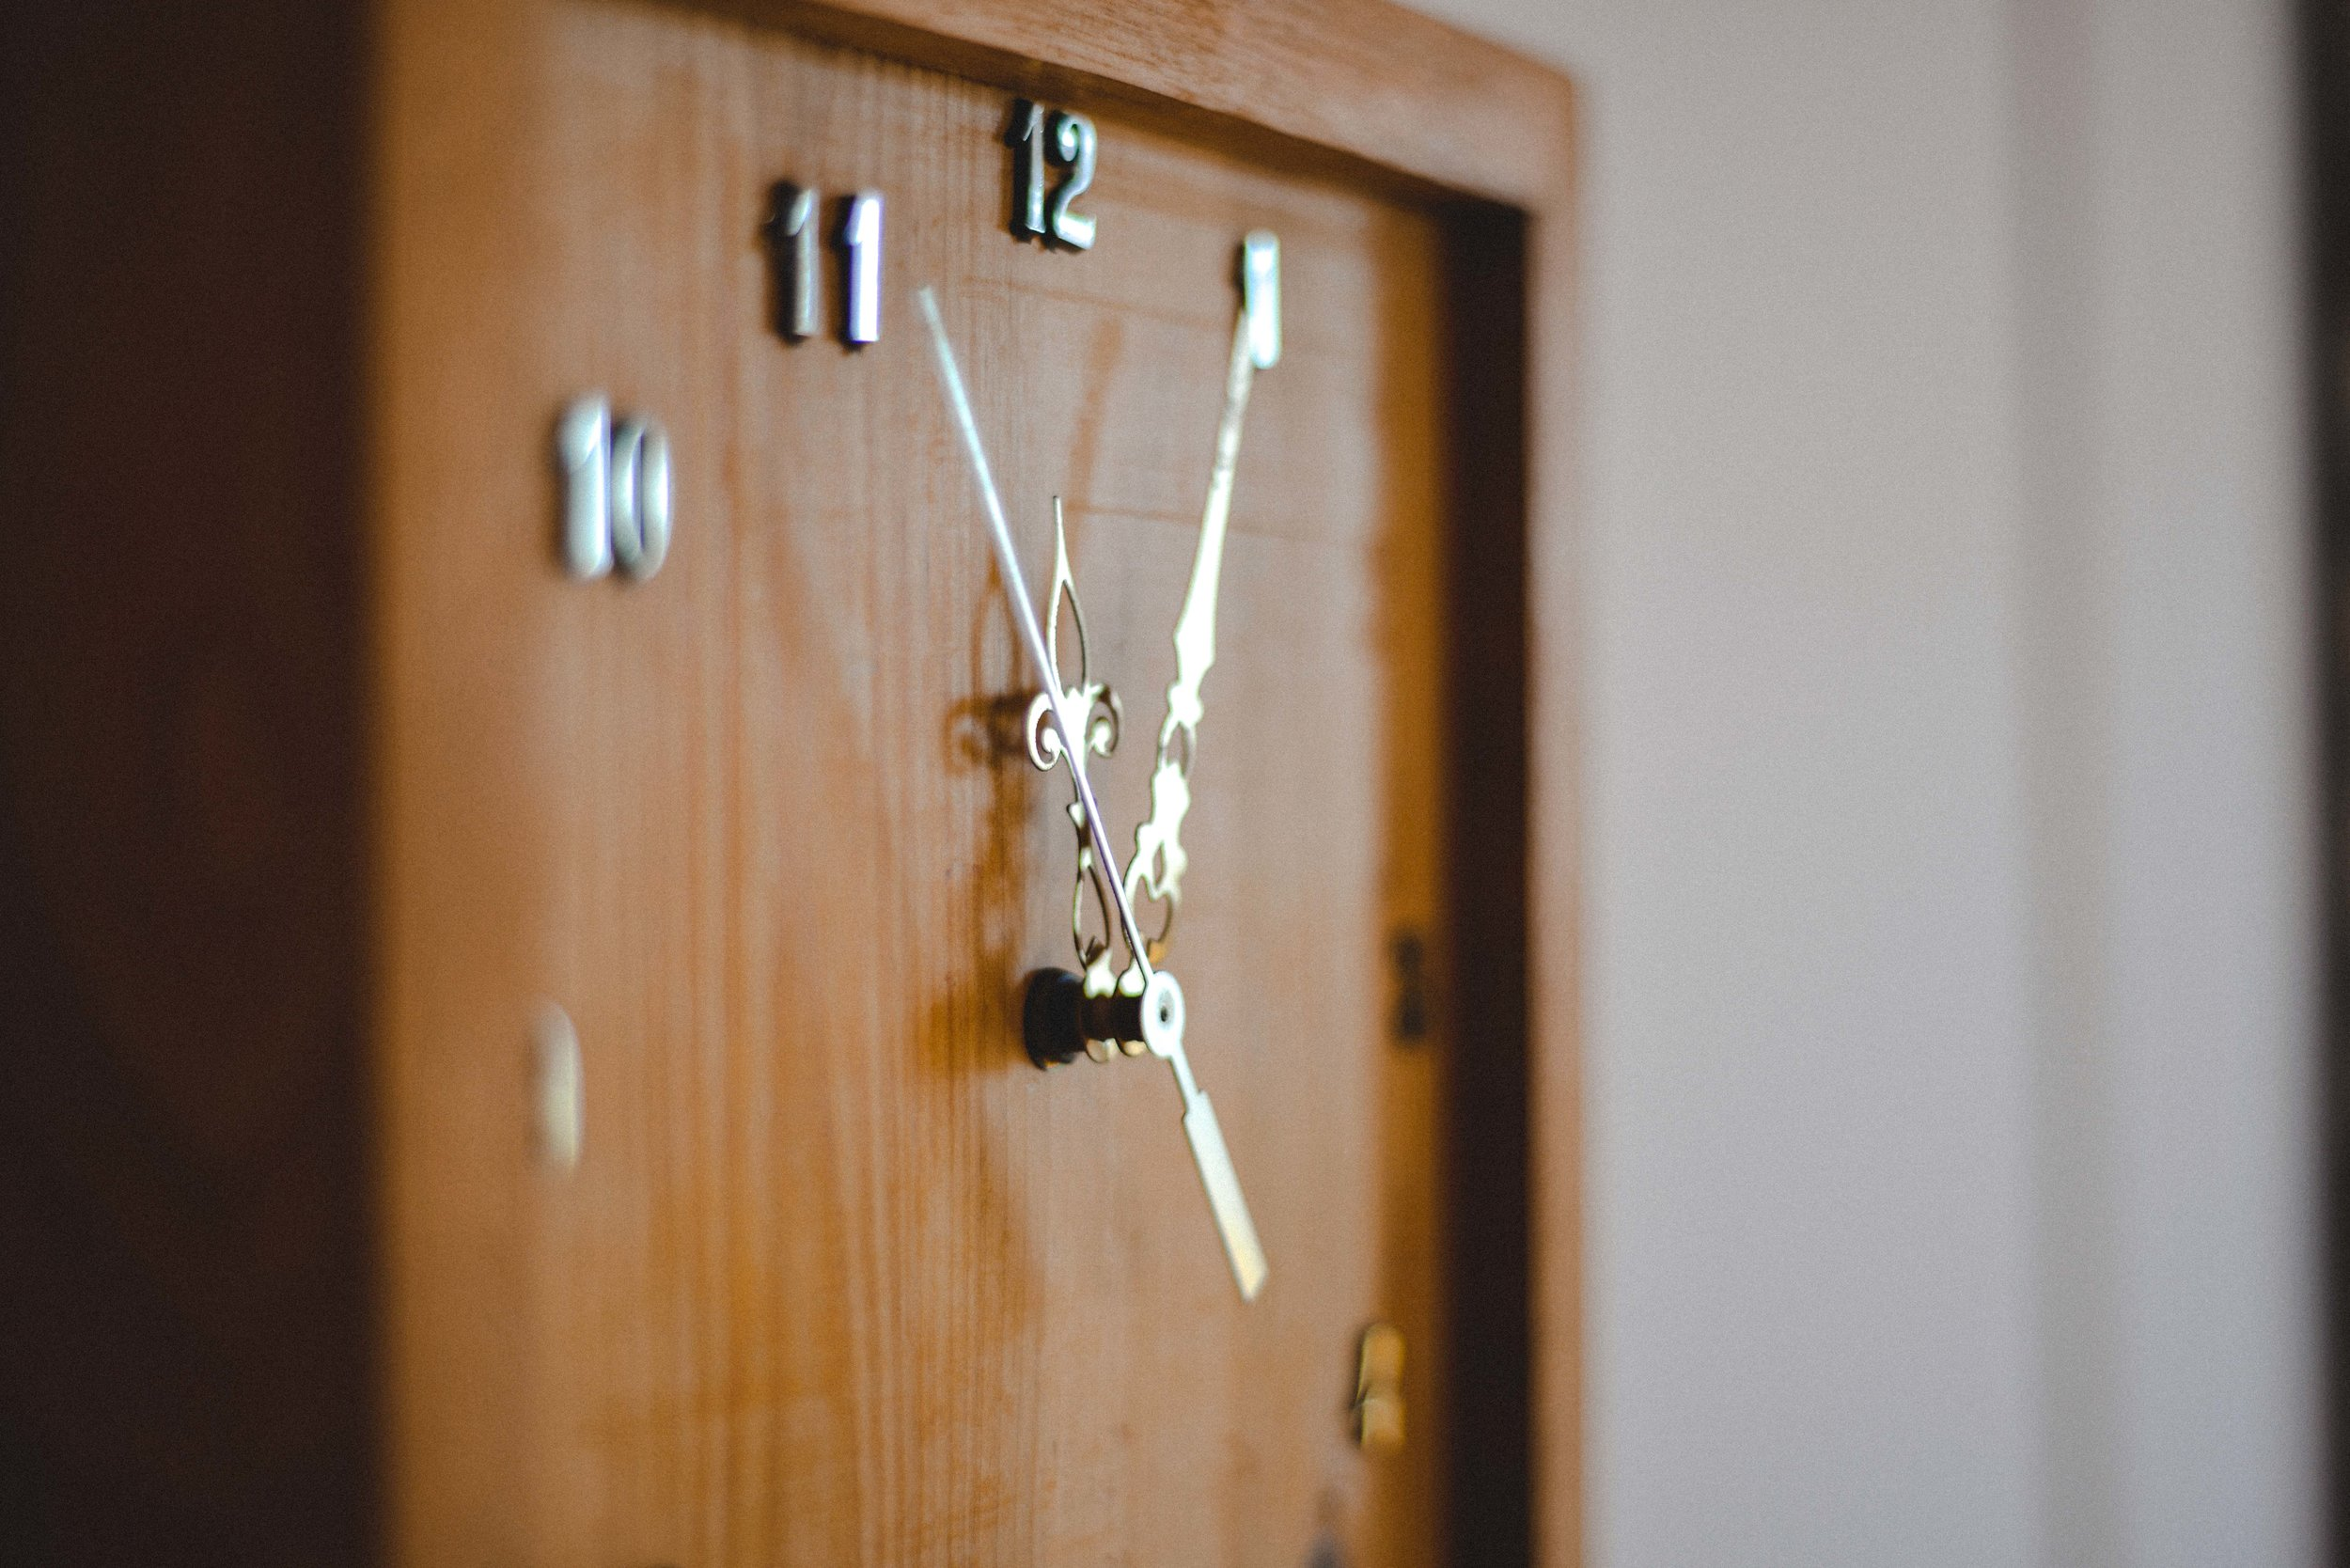 ryan thompson creative photography - clock